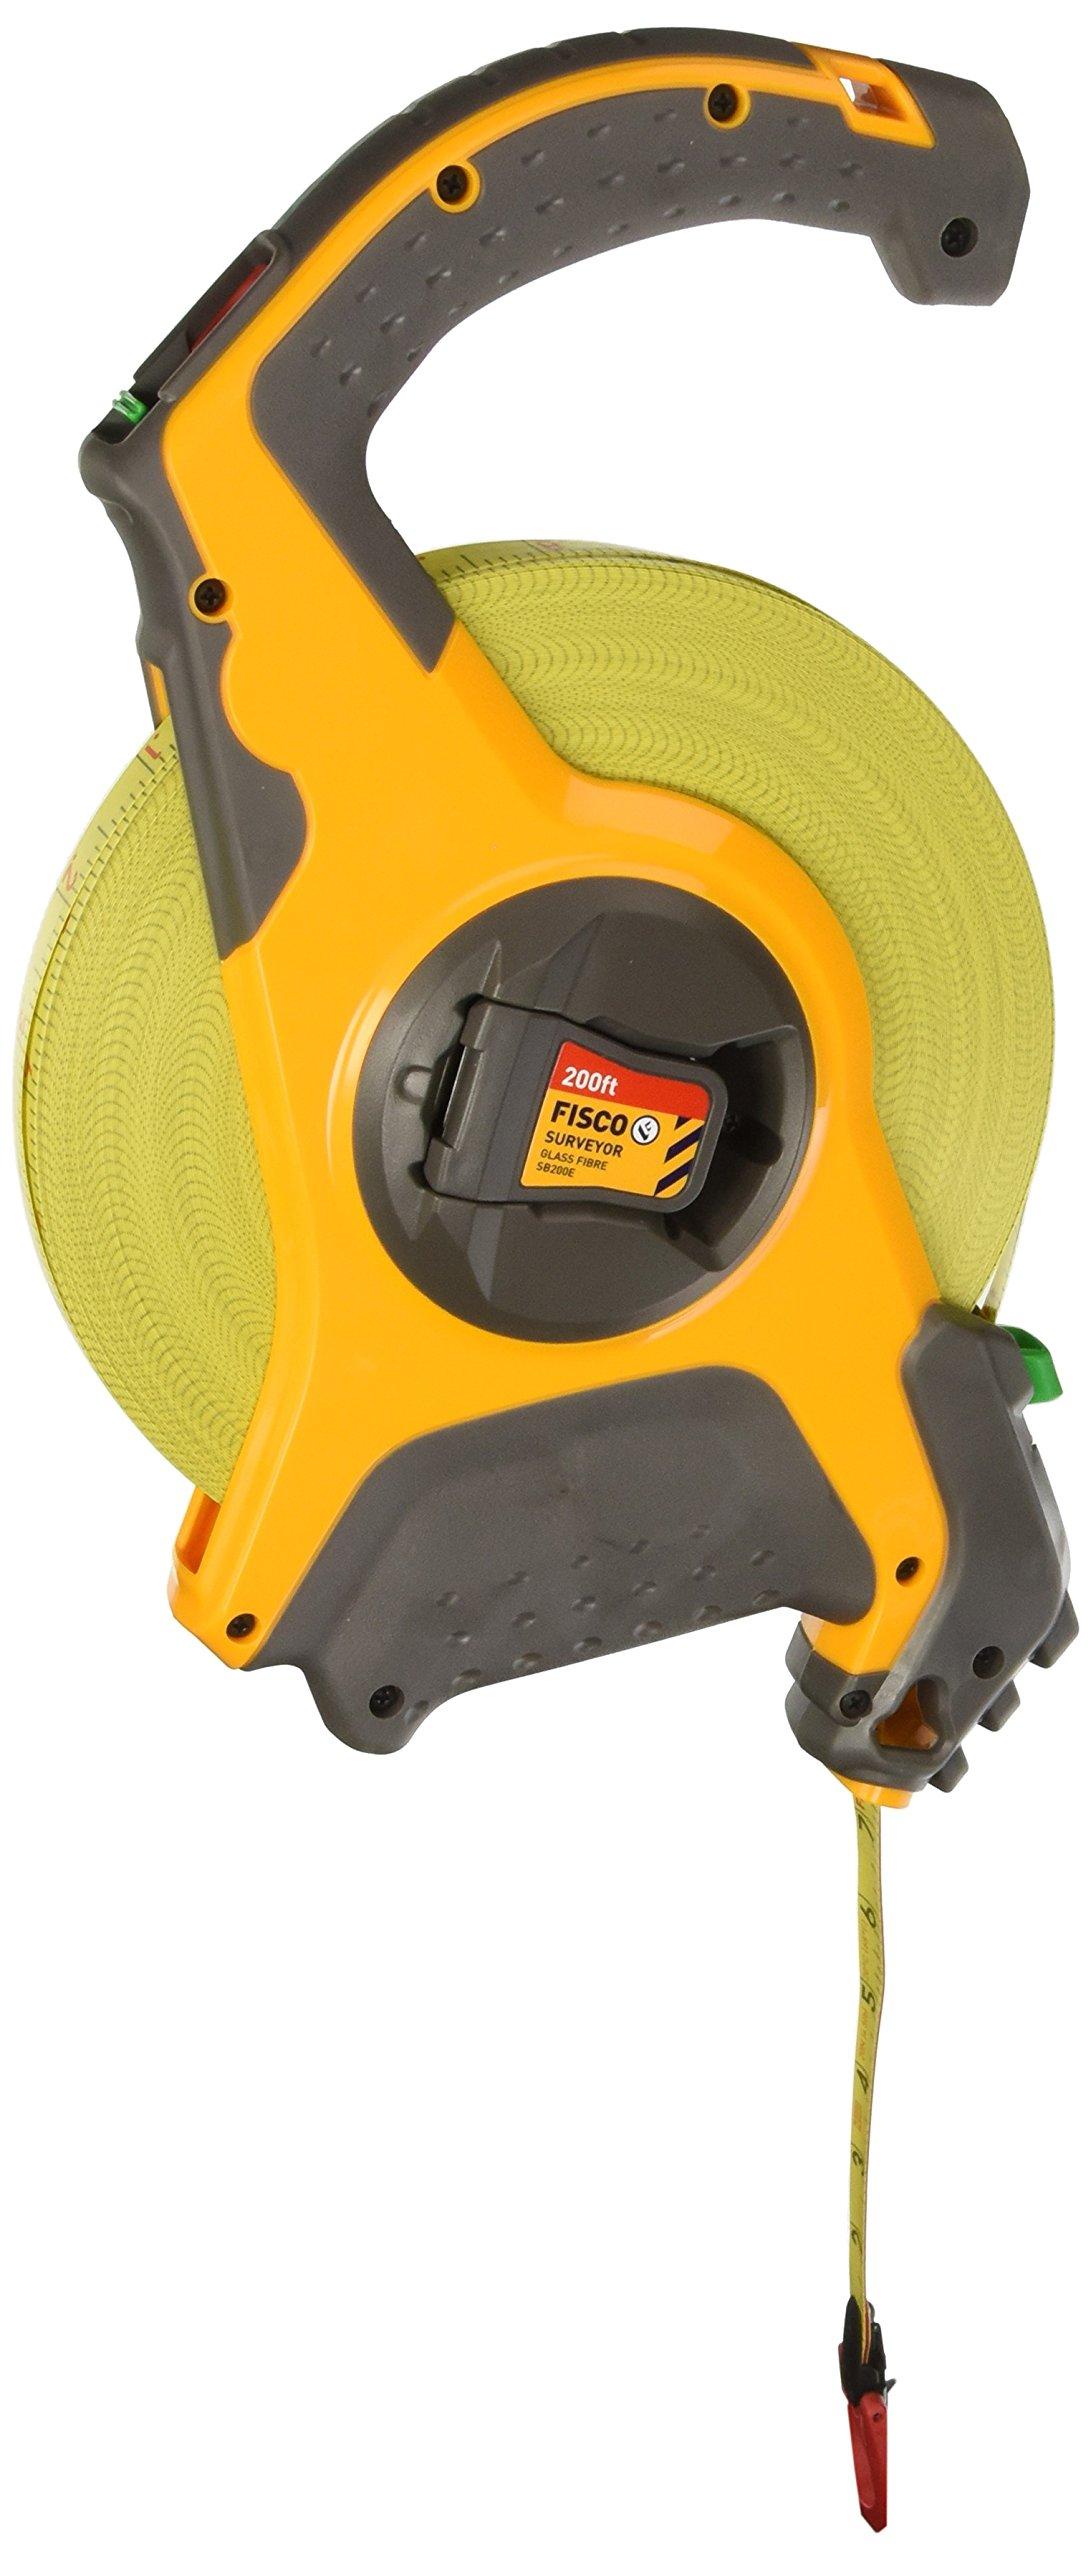 Fisco Tools SB200E Surveyor-Feets Fiberglass Long Tape, 1/2-Inch by 200-Feet